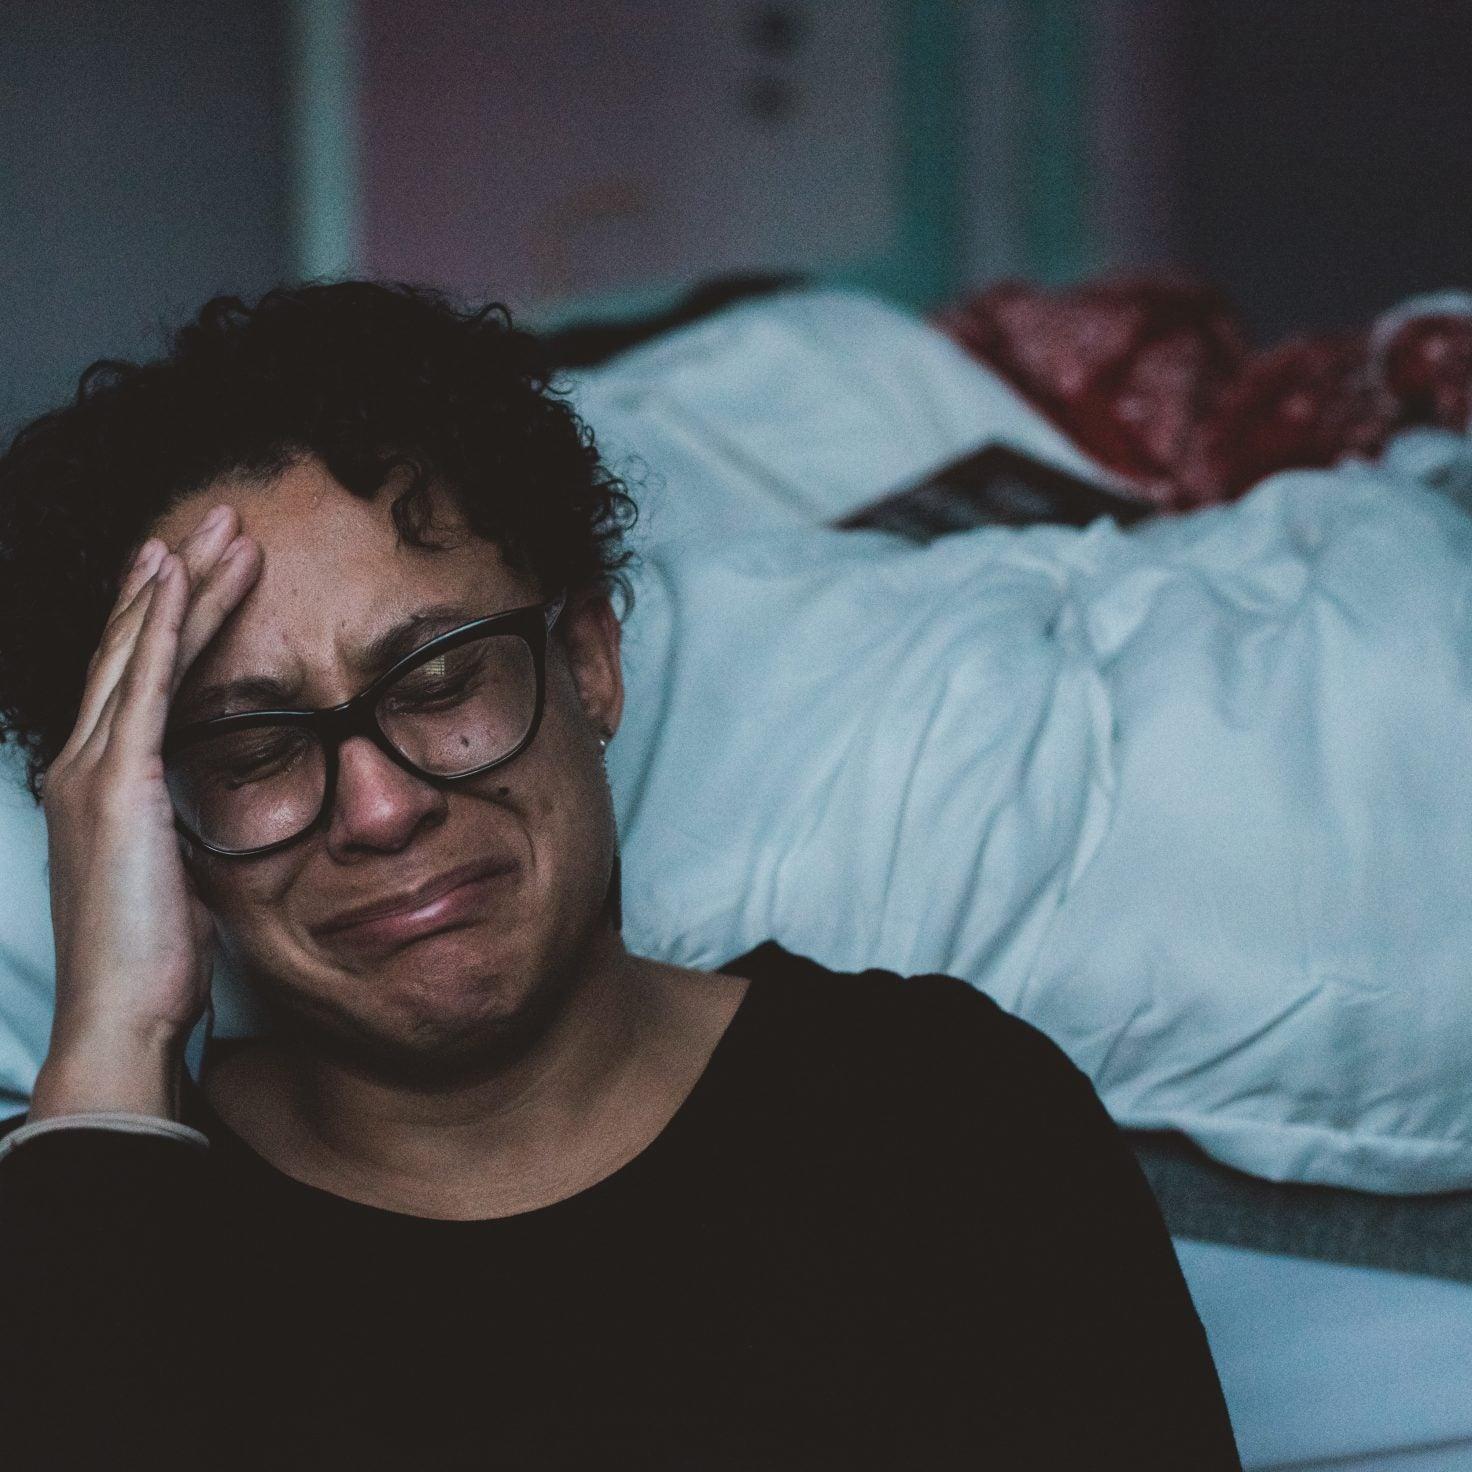 For Black Women Suffering Domestic Abuse, Coronavirus Quarantines Are Life Threatening